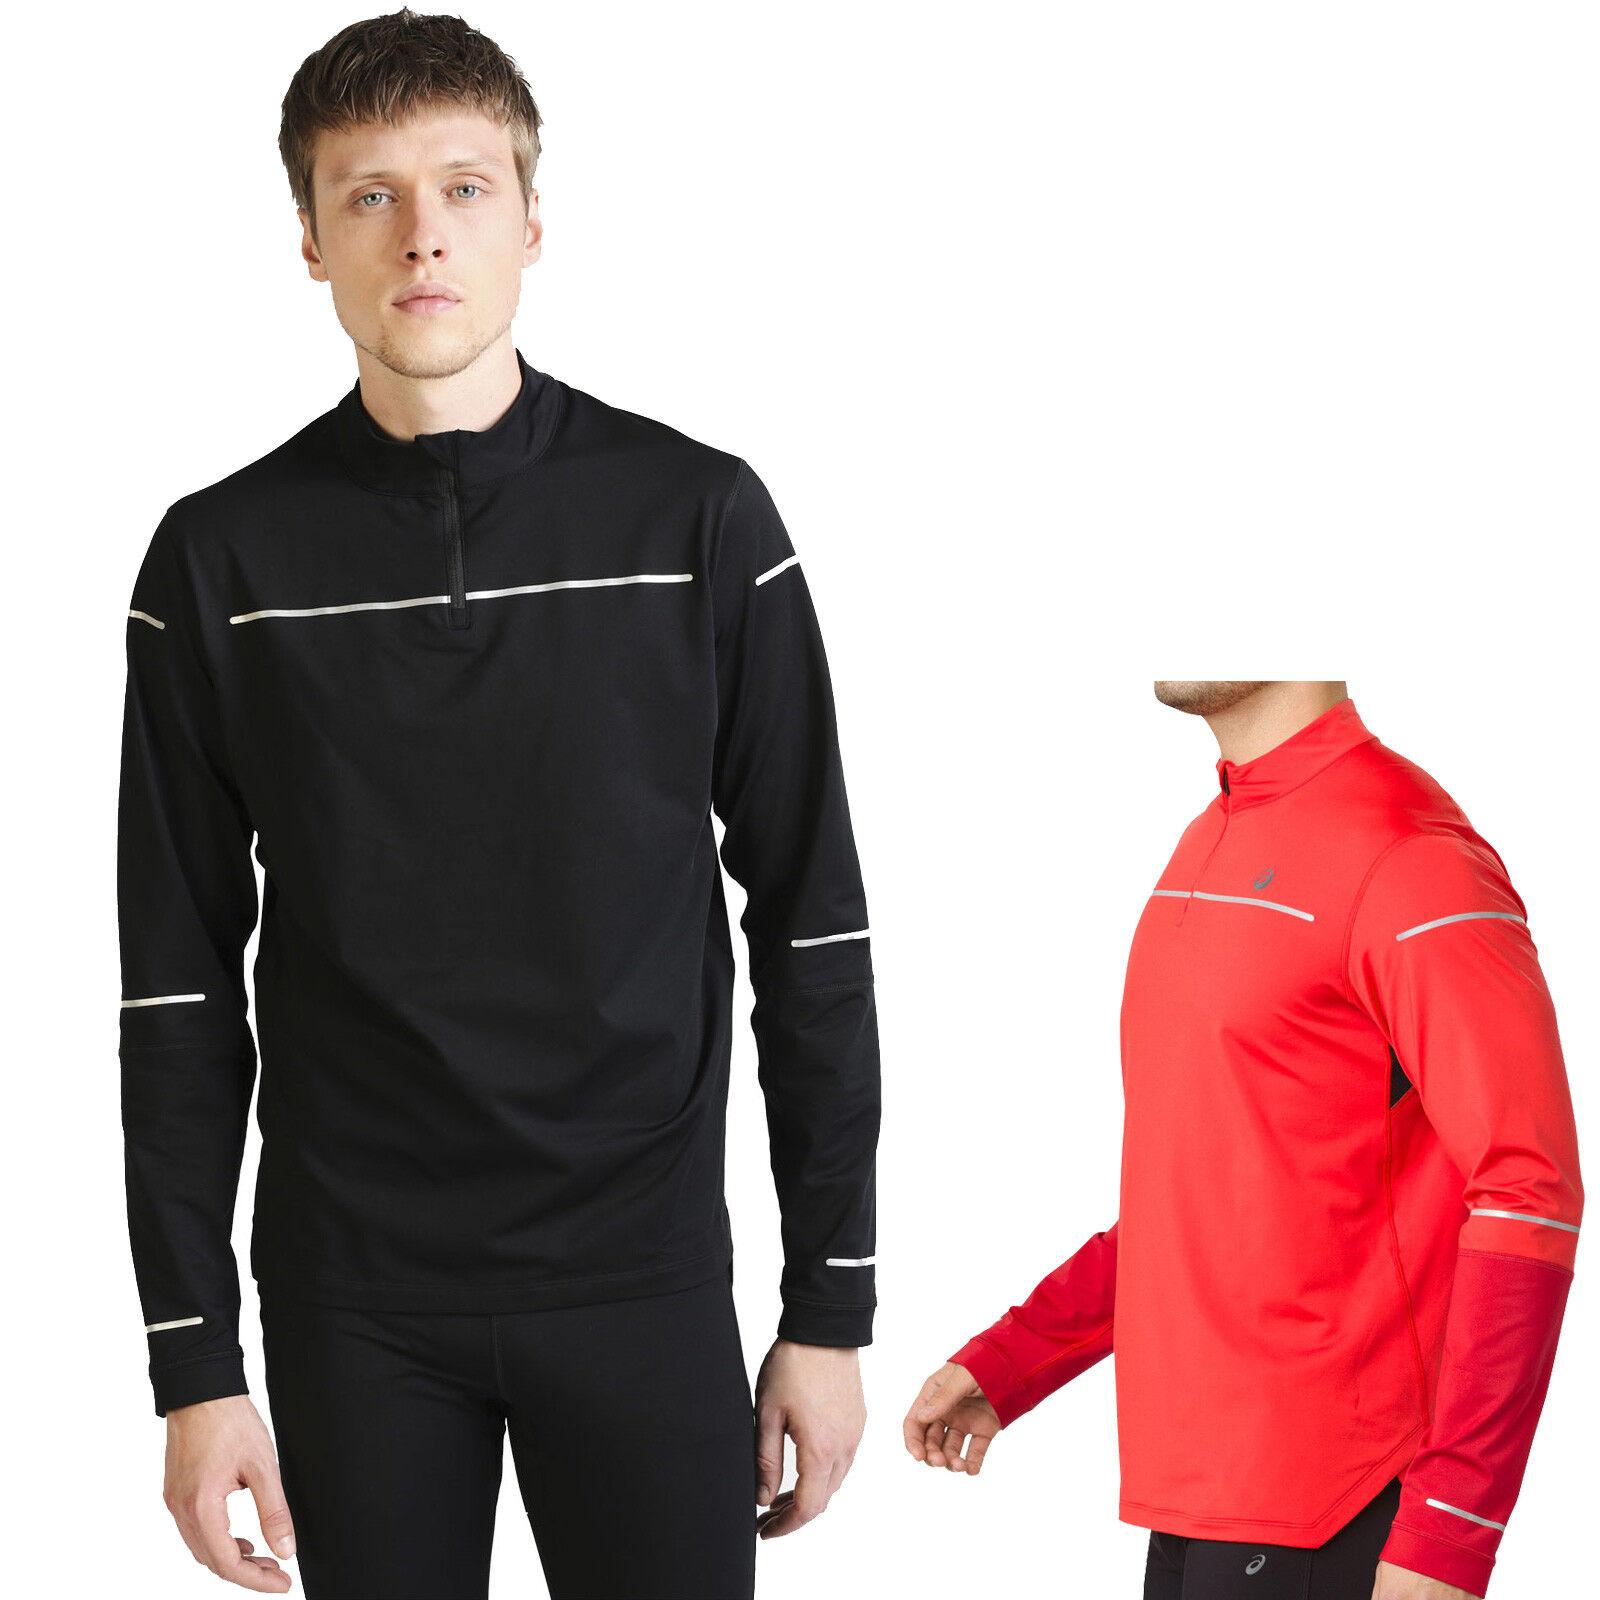 Asics Performance Lite Show half Zip Winter Longshirt Men's Sports Lauf-Shirt